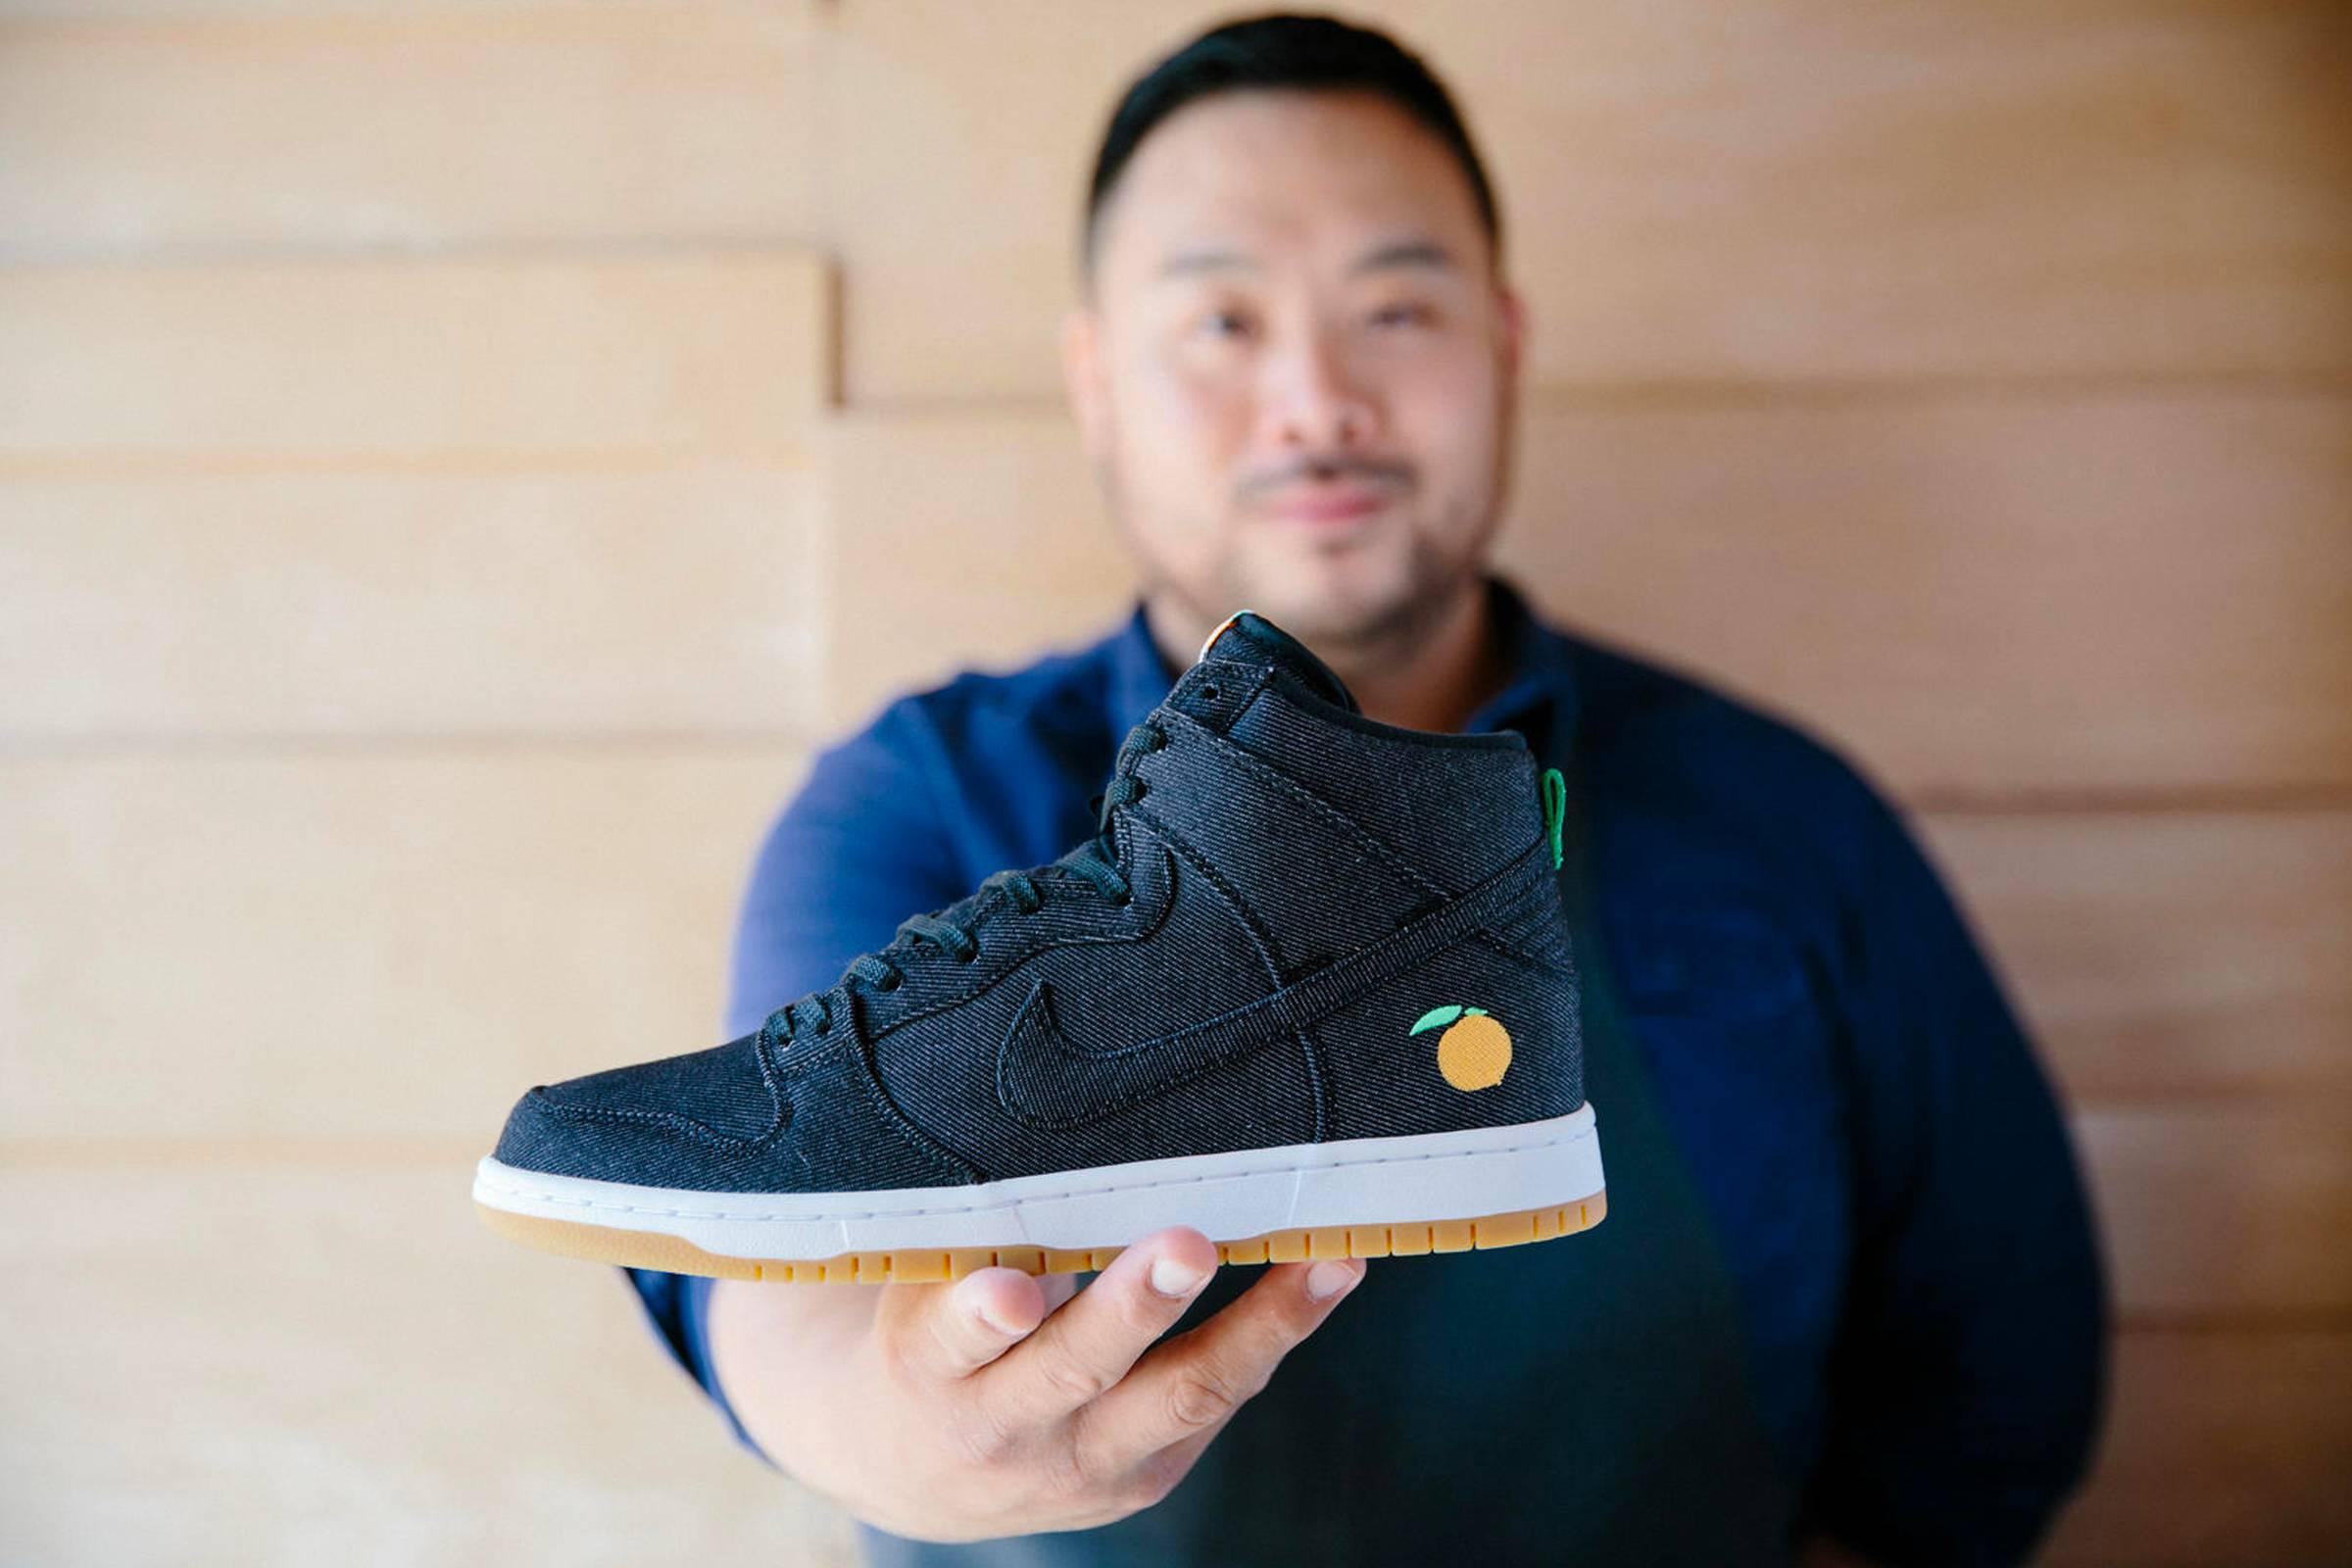 Nike SB and Momofuku